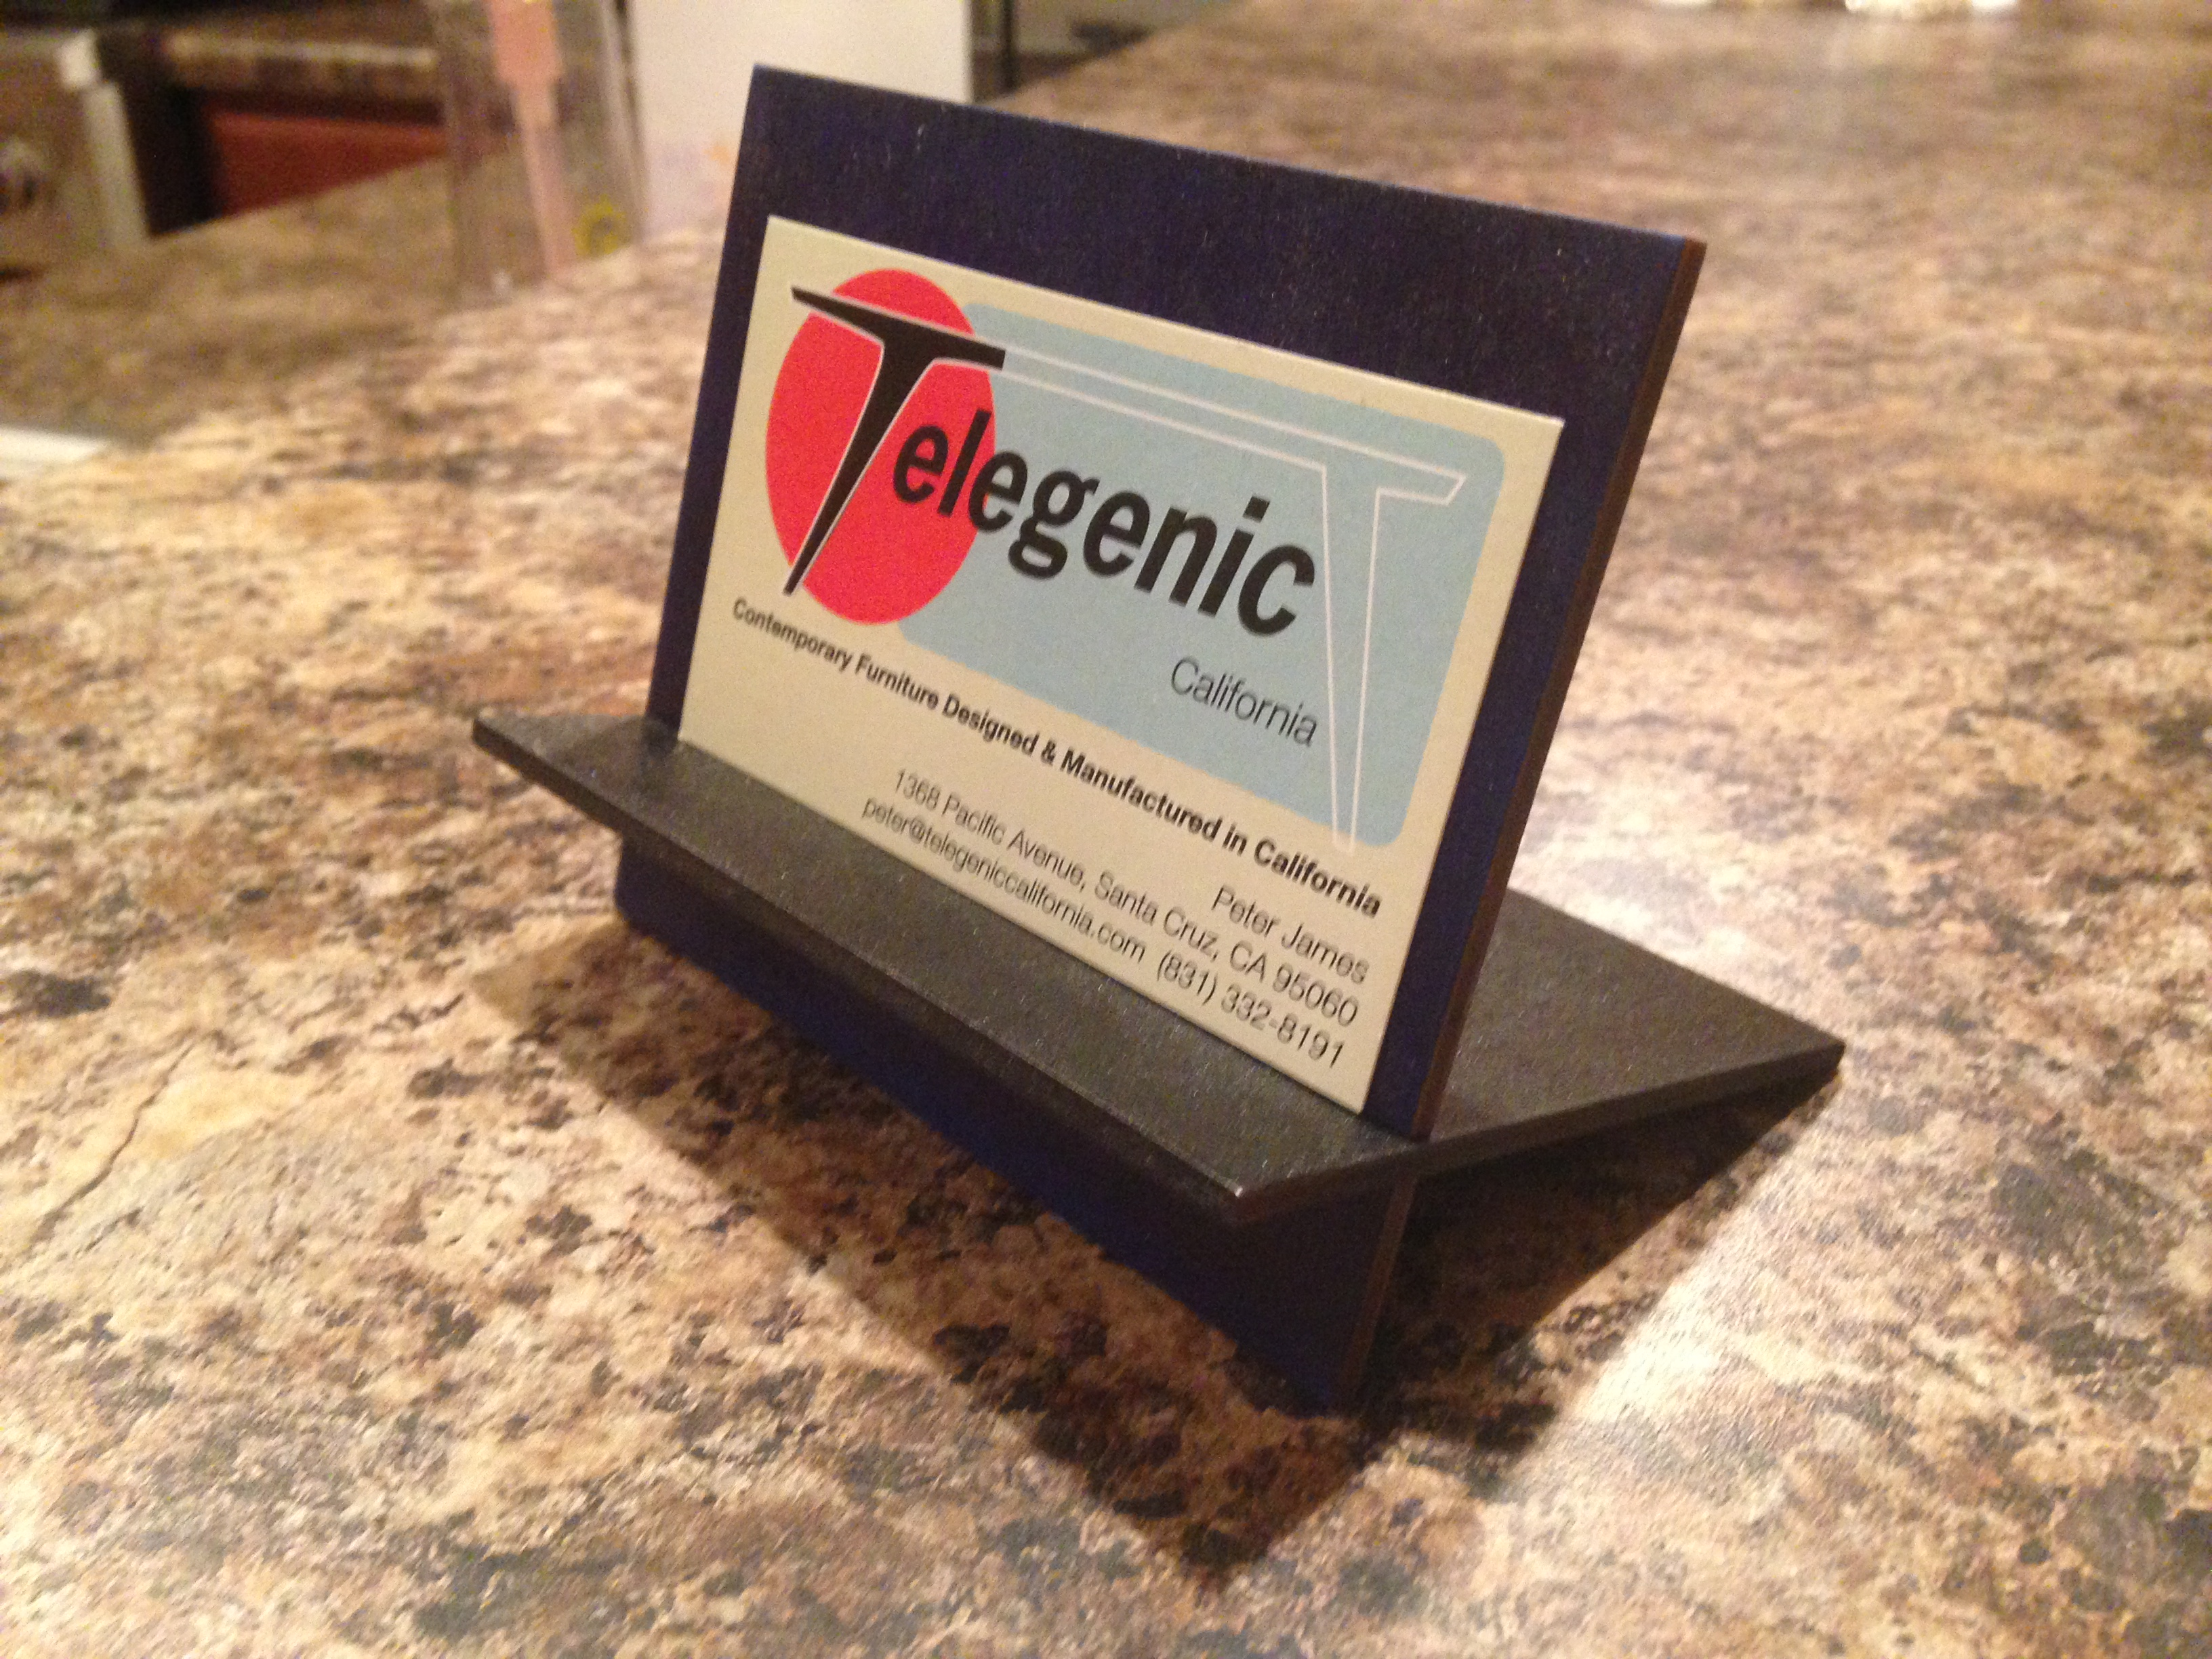 Laser Cut Business Card Holder - Made @ TechShop